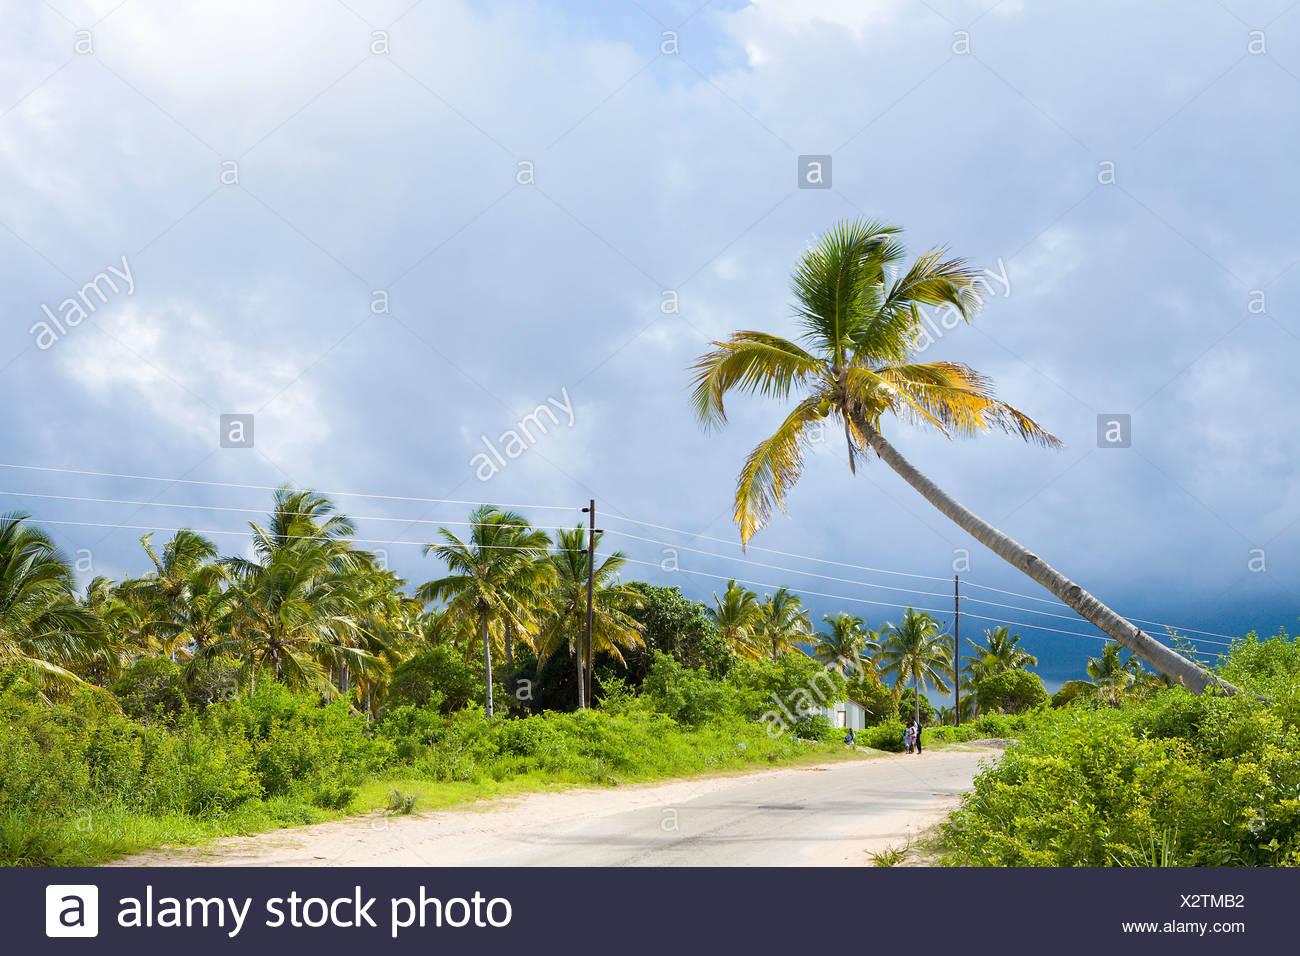 Palmeras a lo largo de la carretera, Ponta Morrungulo, provincia de Inhambane, Mozambique Imagen De Stock